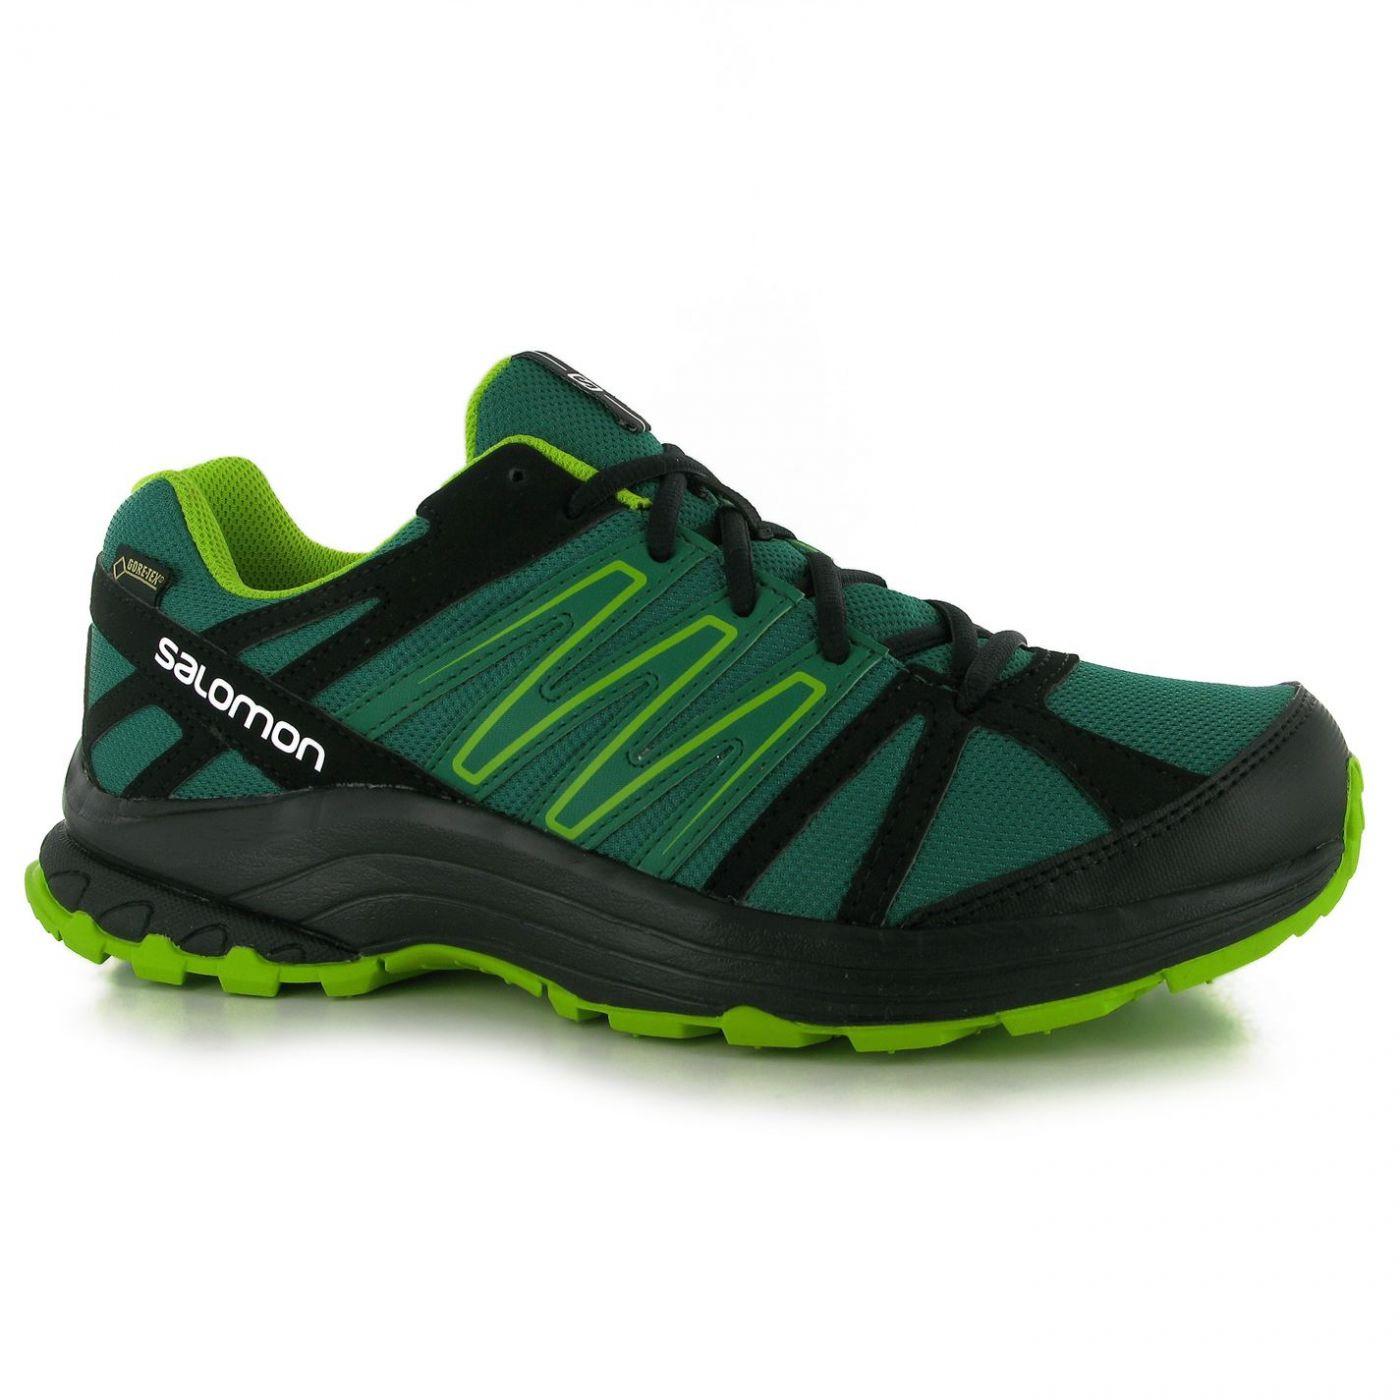 Salomon XA Lander GTX Mens Trail Running Shoes - FACTCOOL